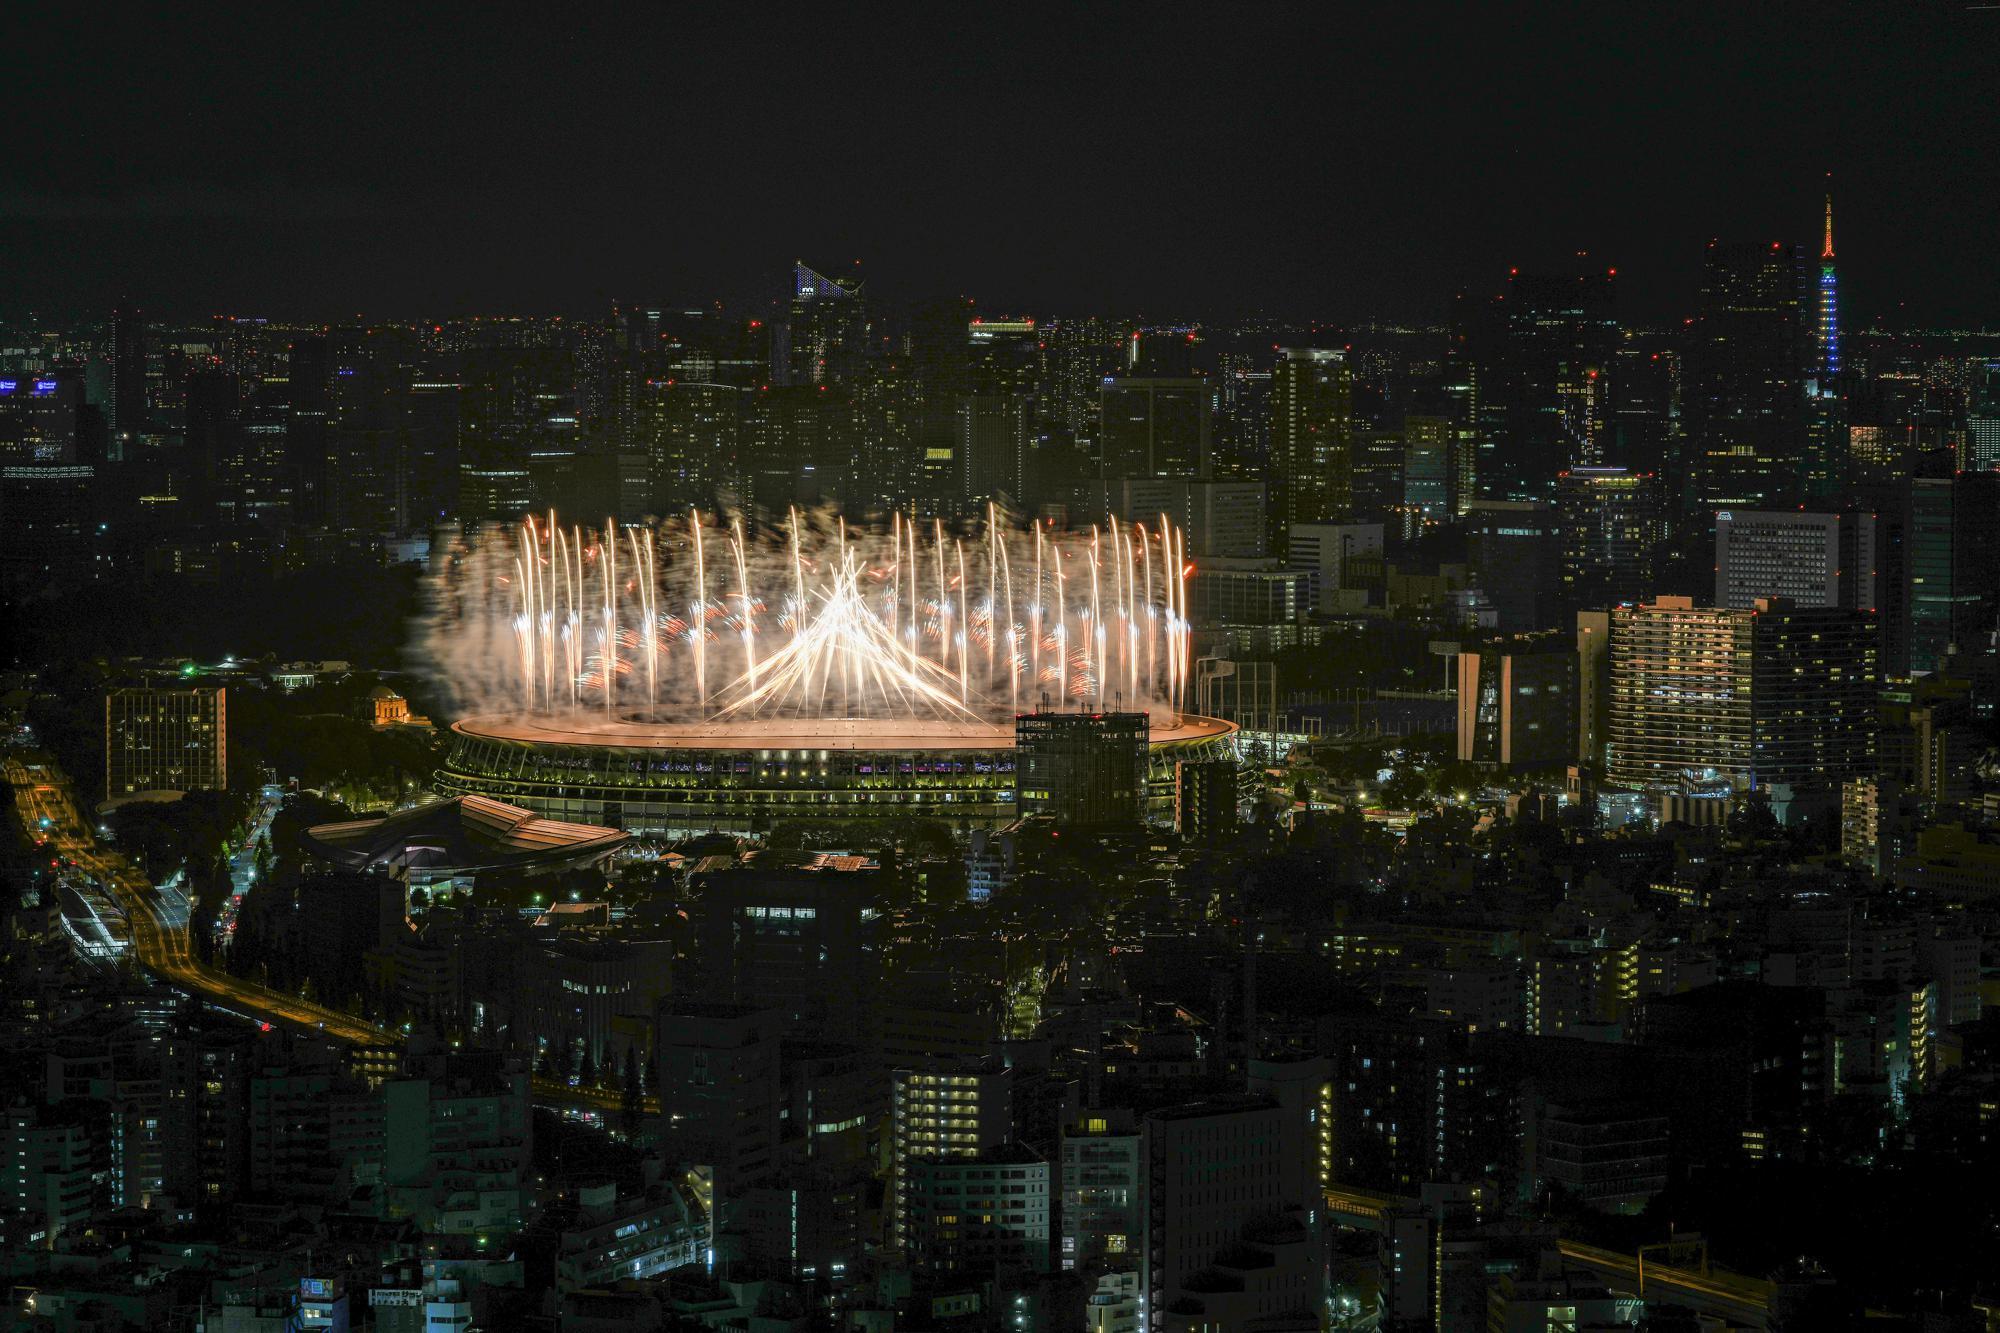 Fireworks illuminate over National Stadium during the opening ceremony of the 2020 Tokyo Olympics, Friday, July 23, 2021, in Tokyo. (AP Photo/Kiichiro Sato)